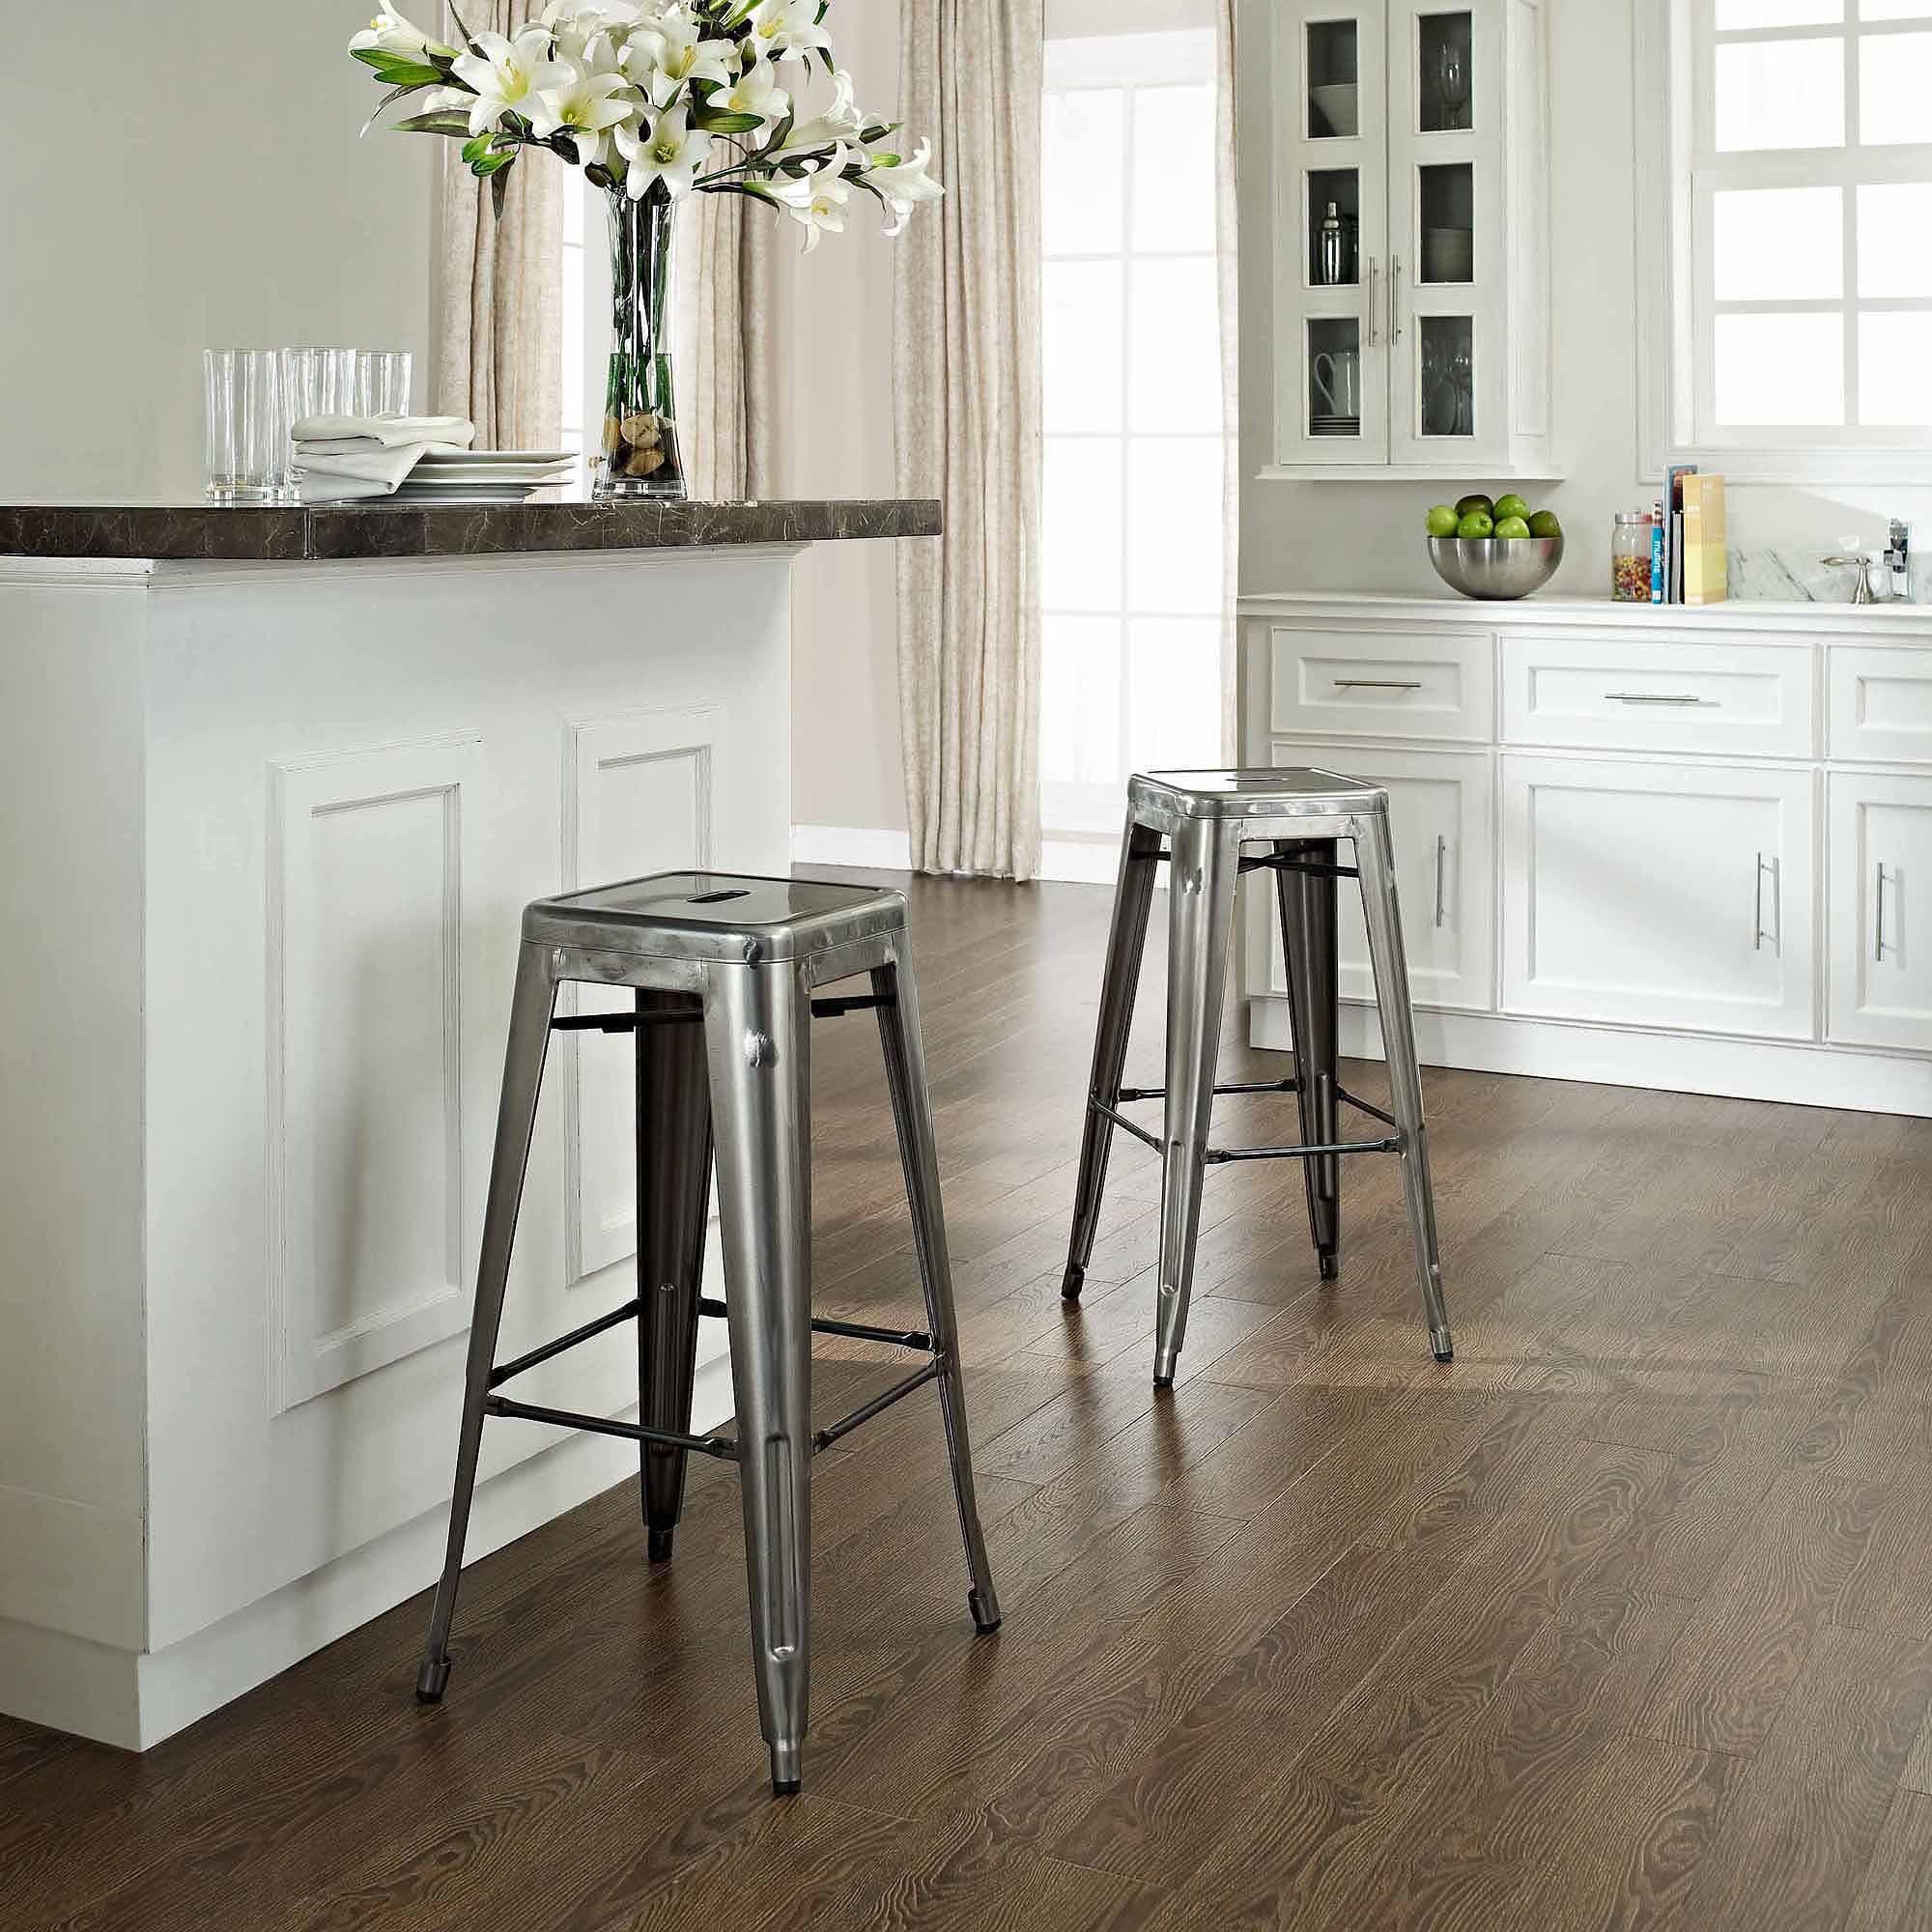 Crosley Furniture Amelia Metal Cafe Barstool in Galvanized 2pk